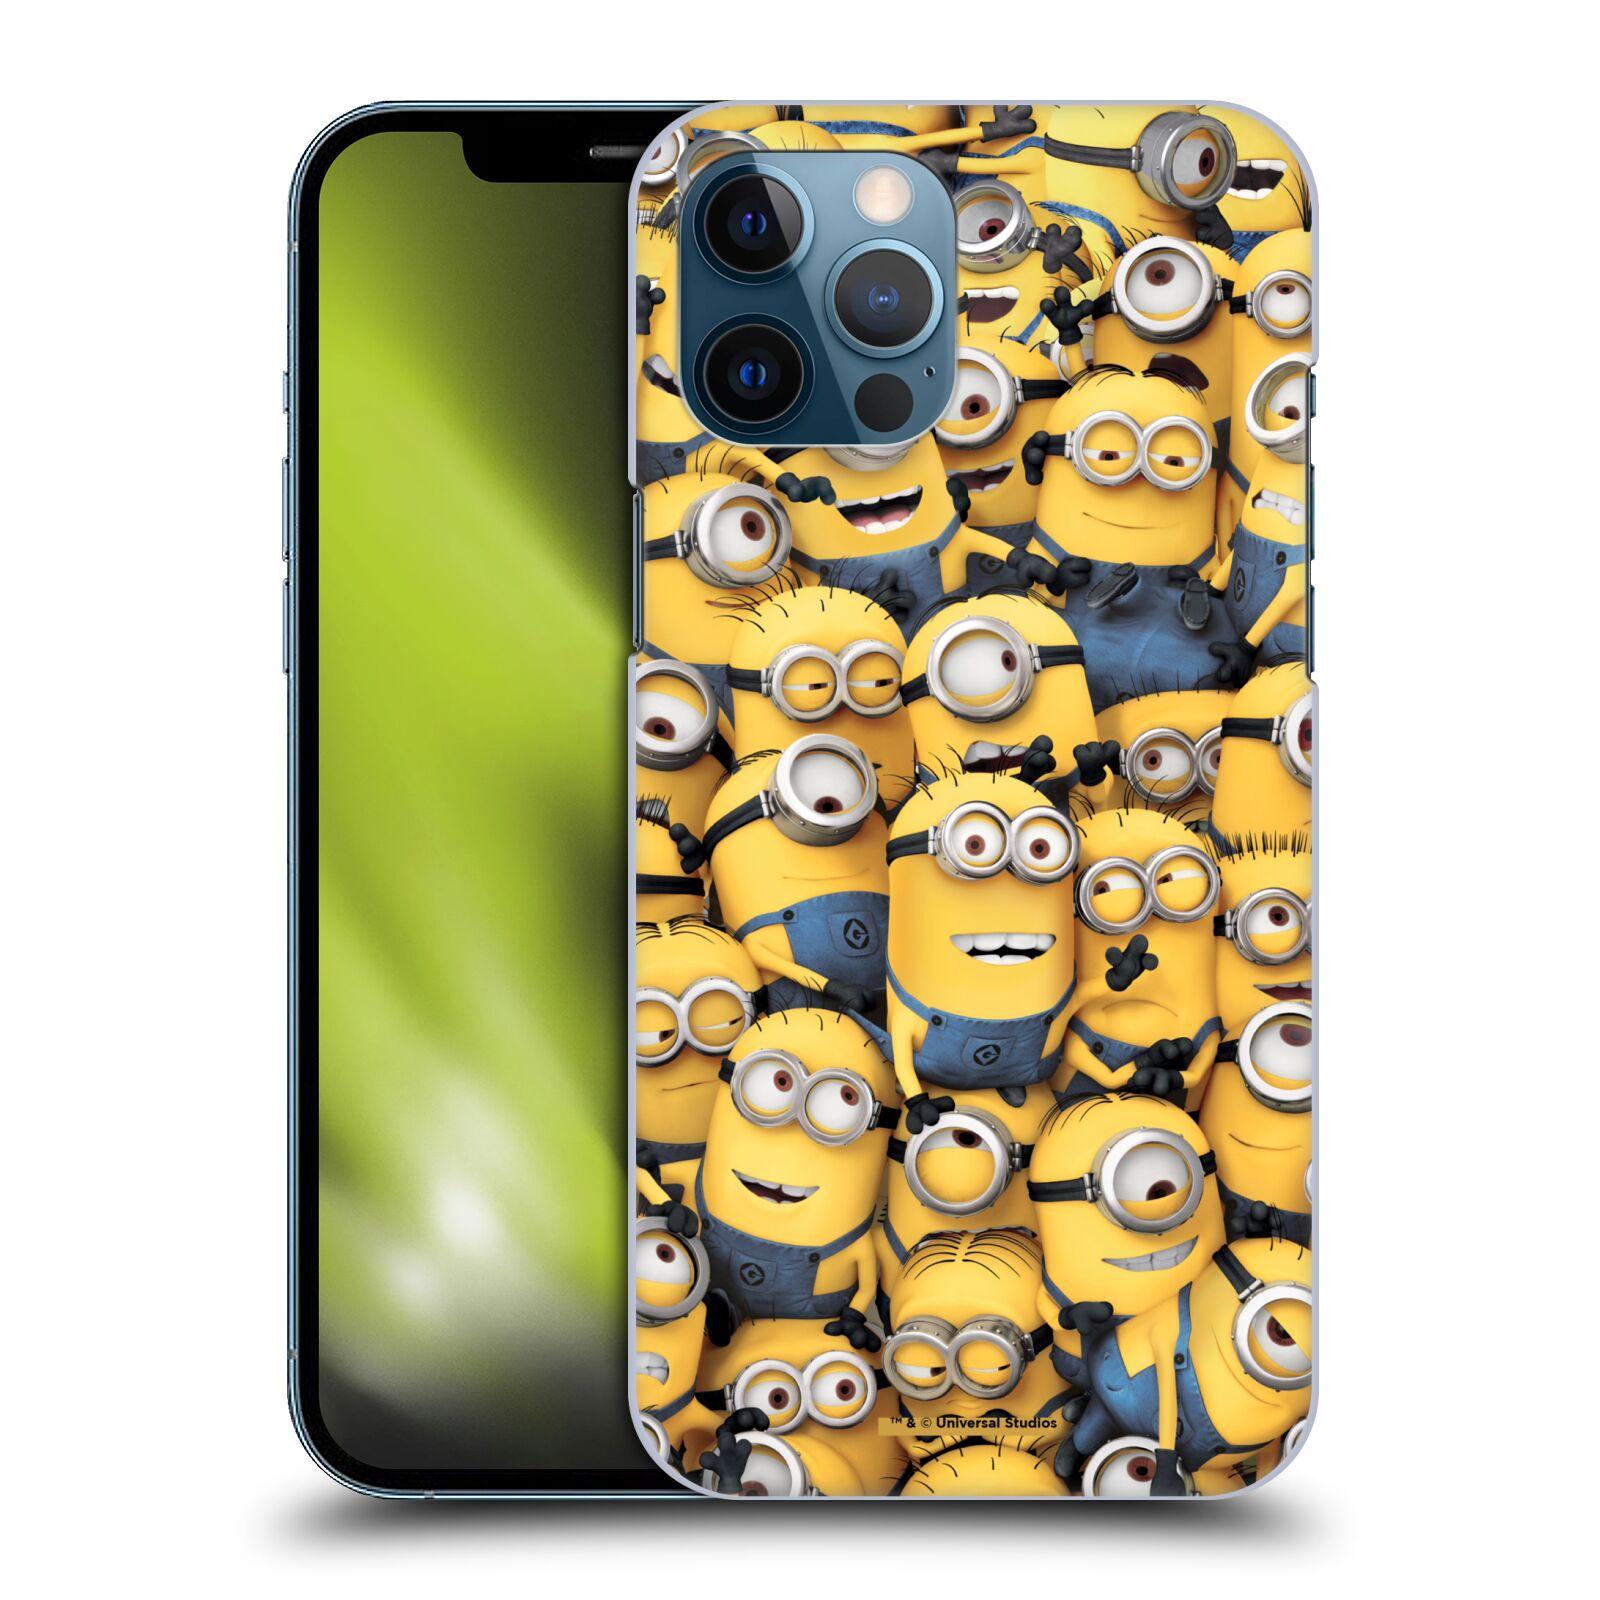 Plastové pouzdro na mobil Apple iPhone 12 Pro Max - Head Case - Mimoni všude z filmu Já, padouch - Despicable Me